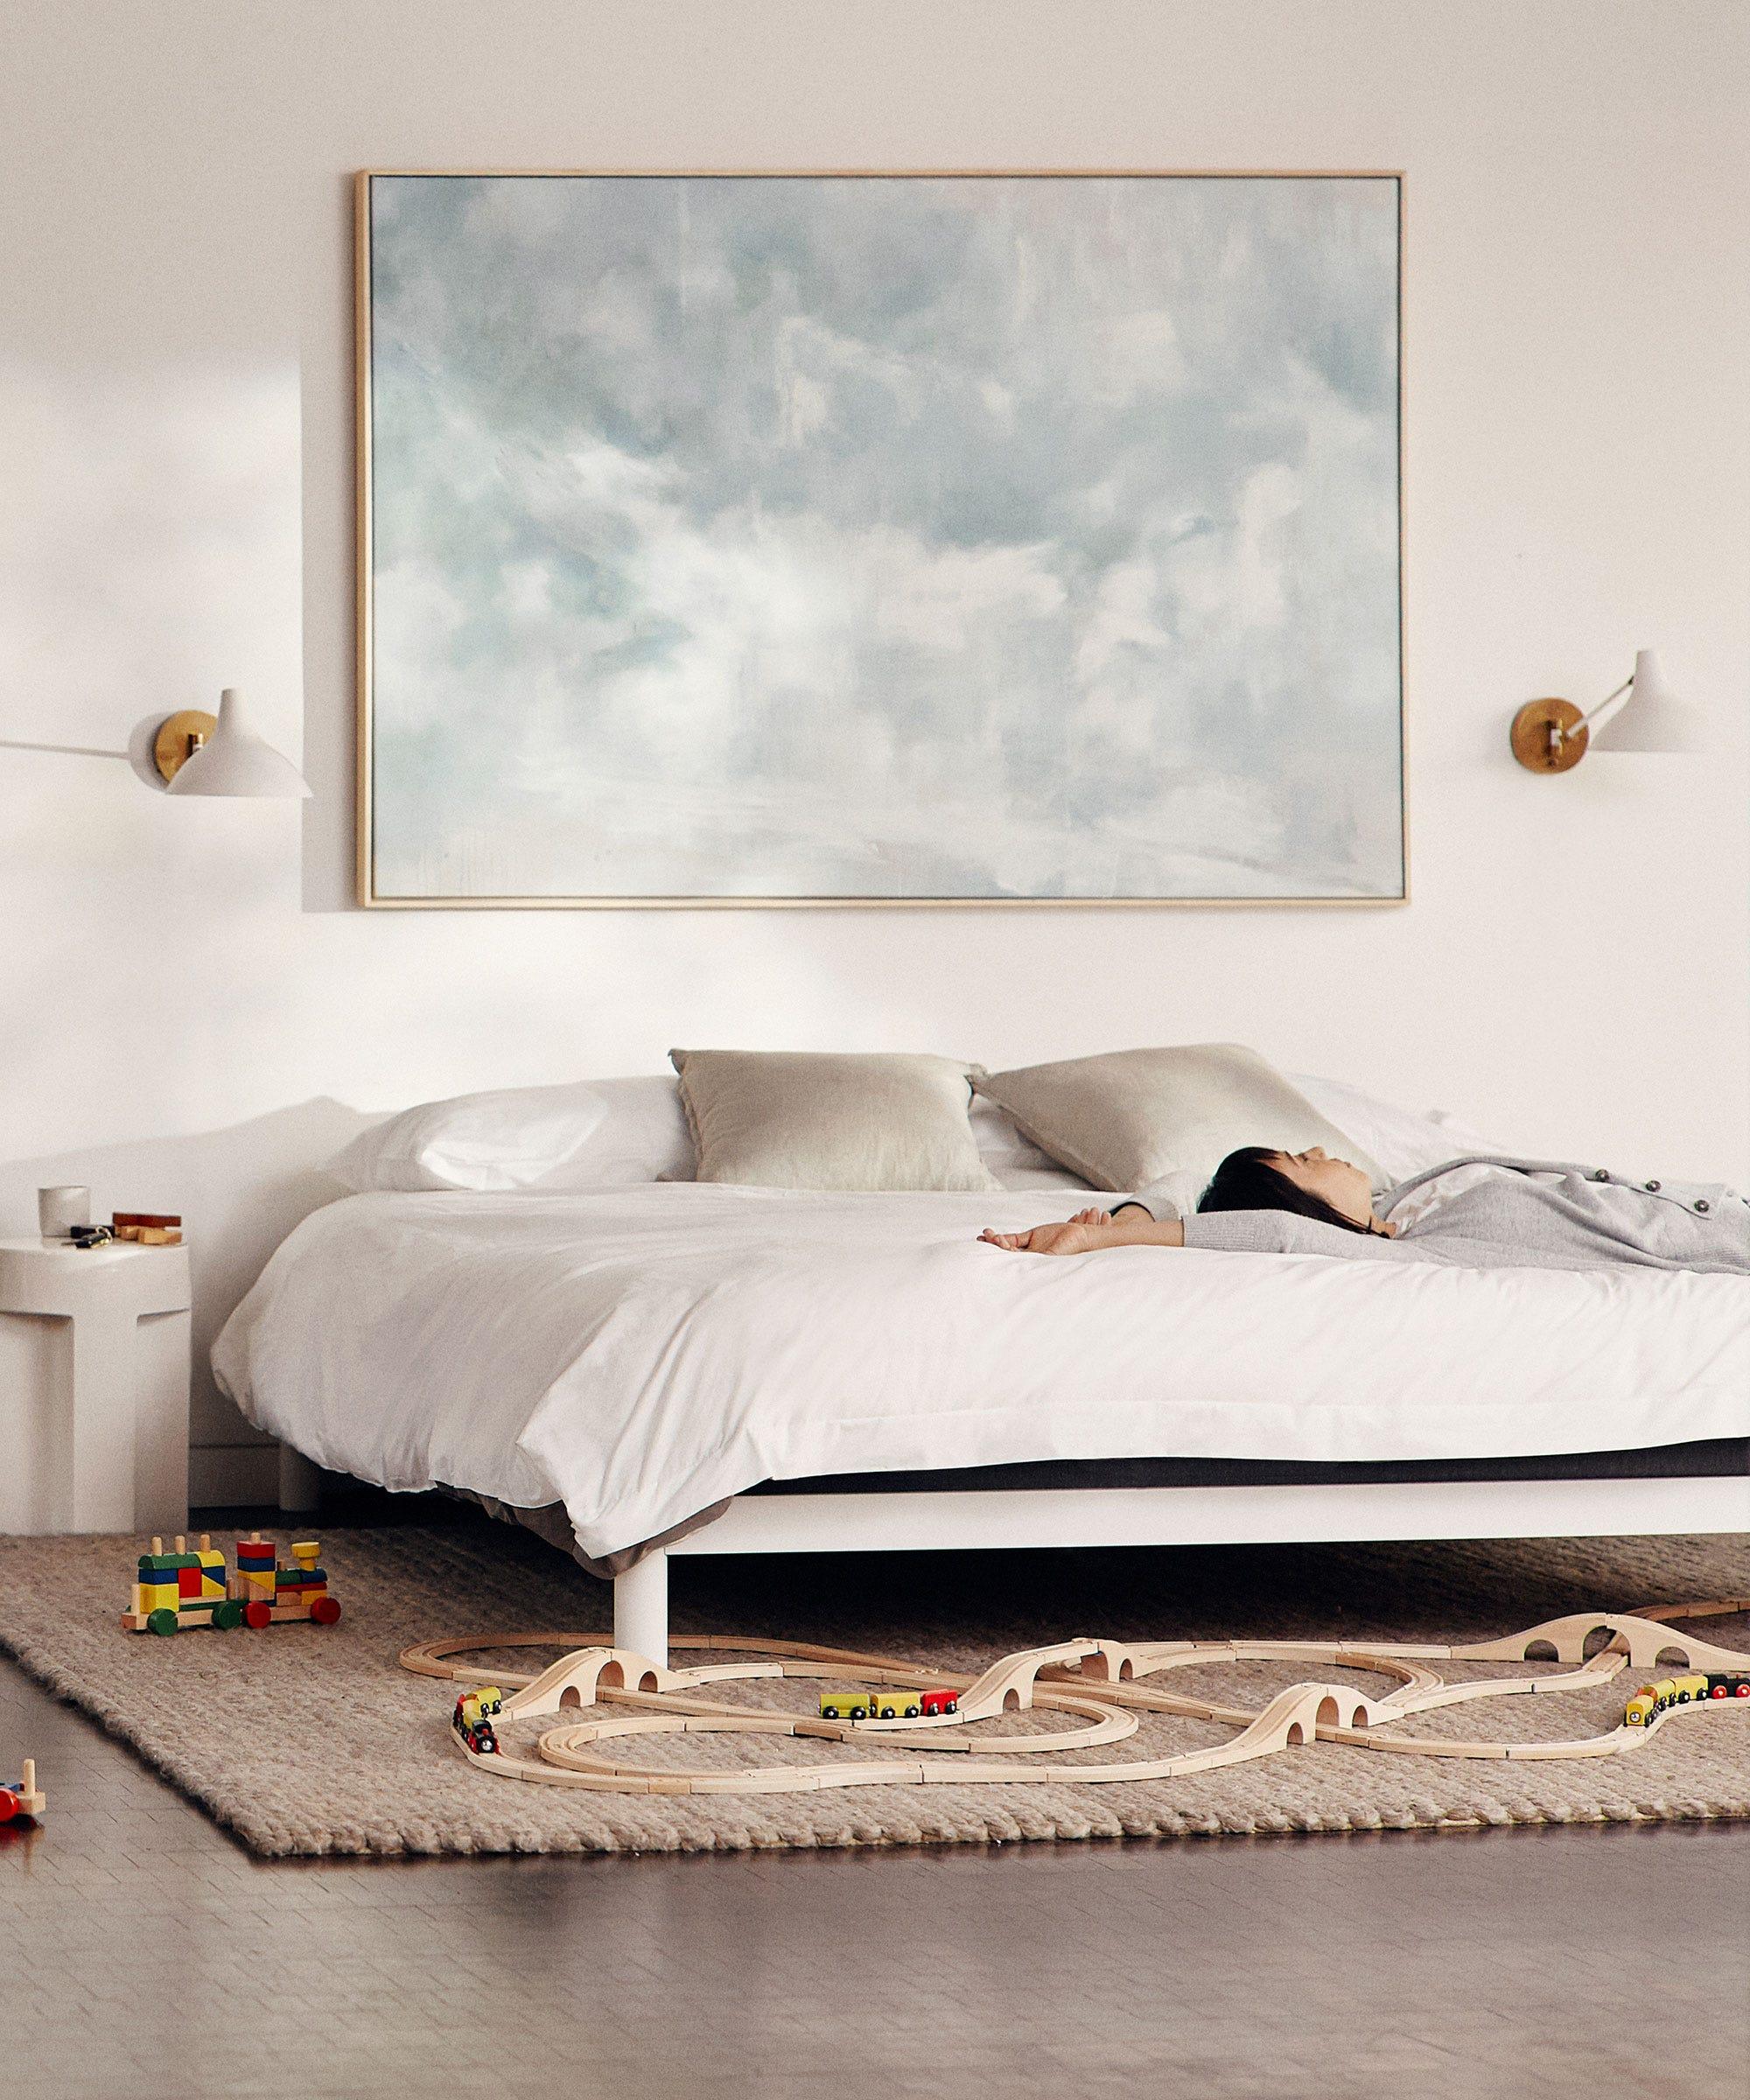 made mattress helix bed buy sell best million sleep raises online to order mattresses time techcrunch